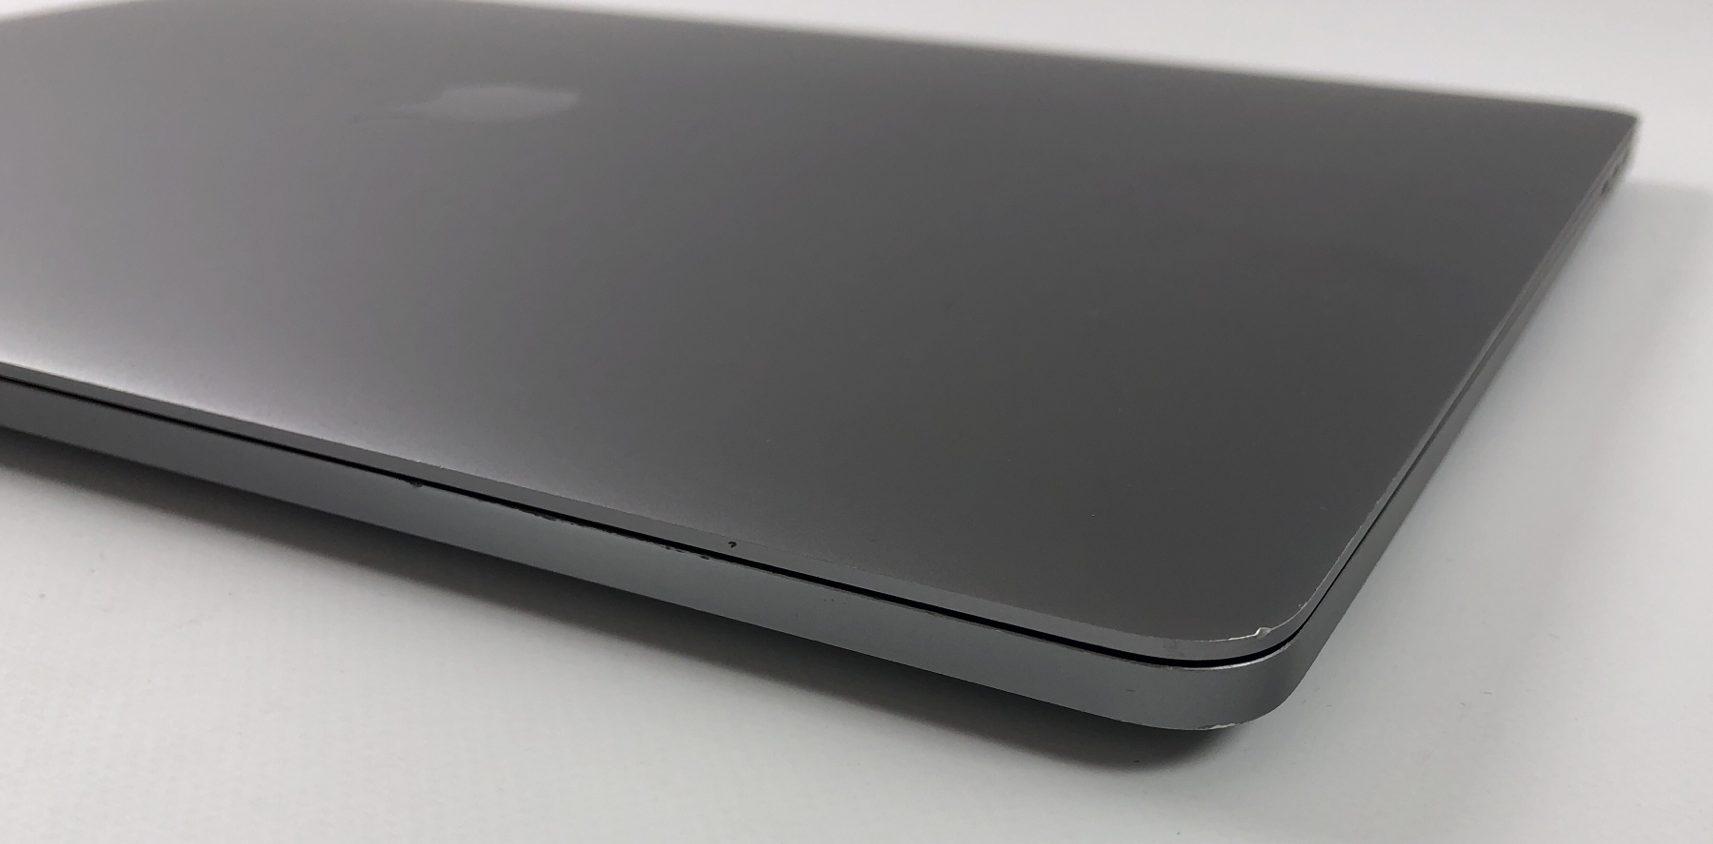 "MacBook Pro 15"" Touch Bar Mid 2017 (Intel Quad-Core i7 2.8 GHz 16 GB RAM 256 GB SSD), Space Gray, Intel Quad-Core i7 2.8 GHz, 16 GB RAM, 256 GB SSD, image 5"